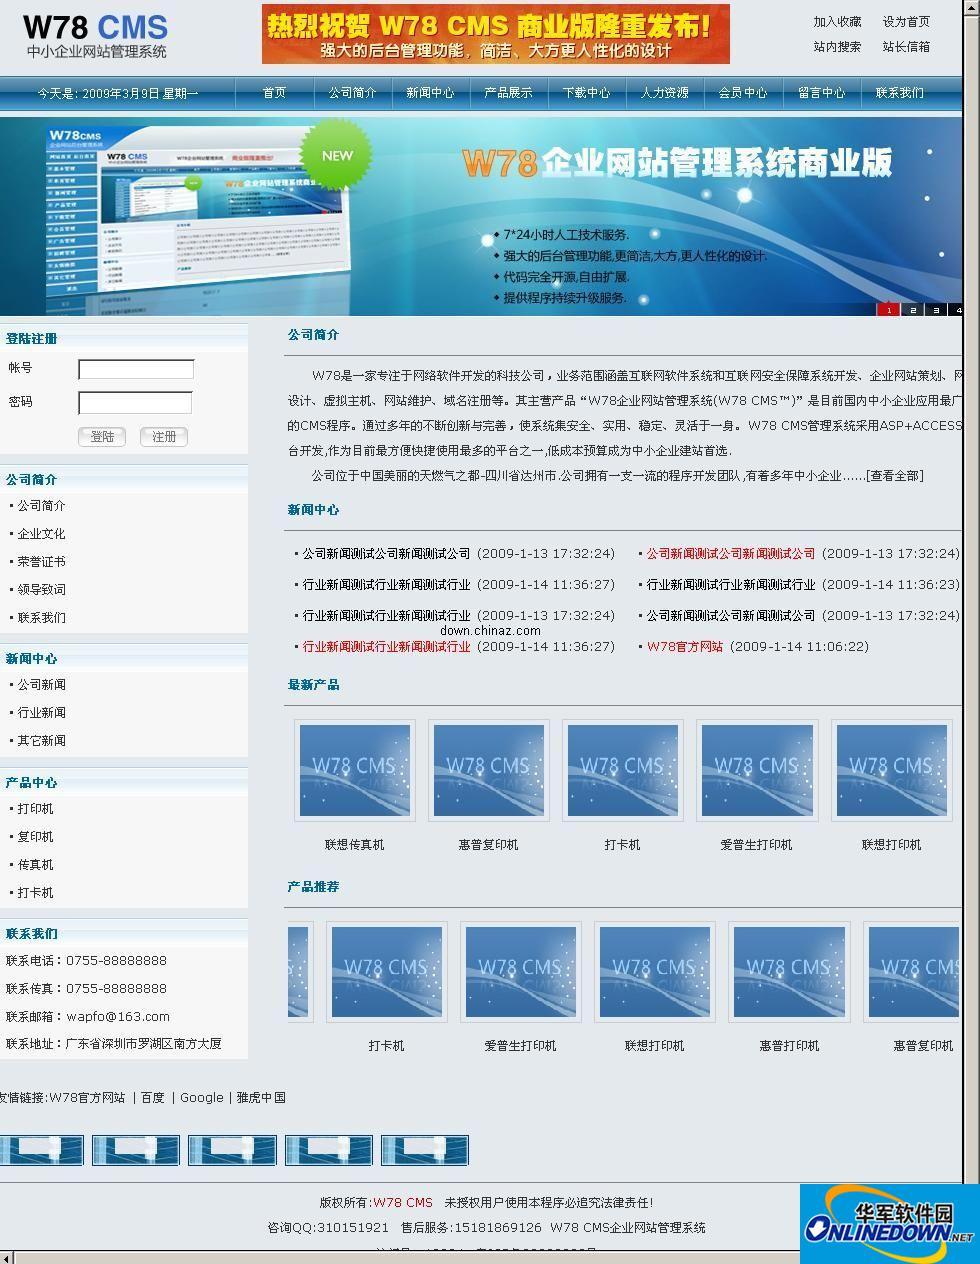 W78CMS asp 企业网站管理系统简体中文版 PC版